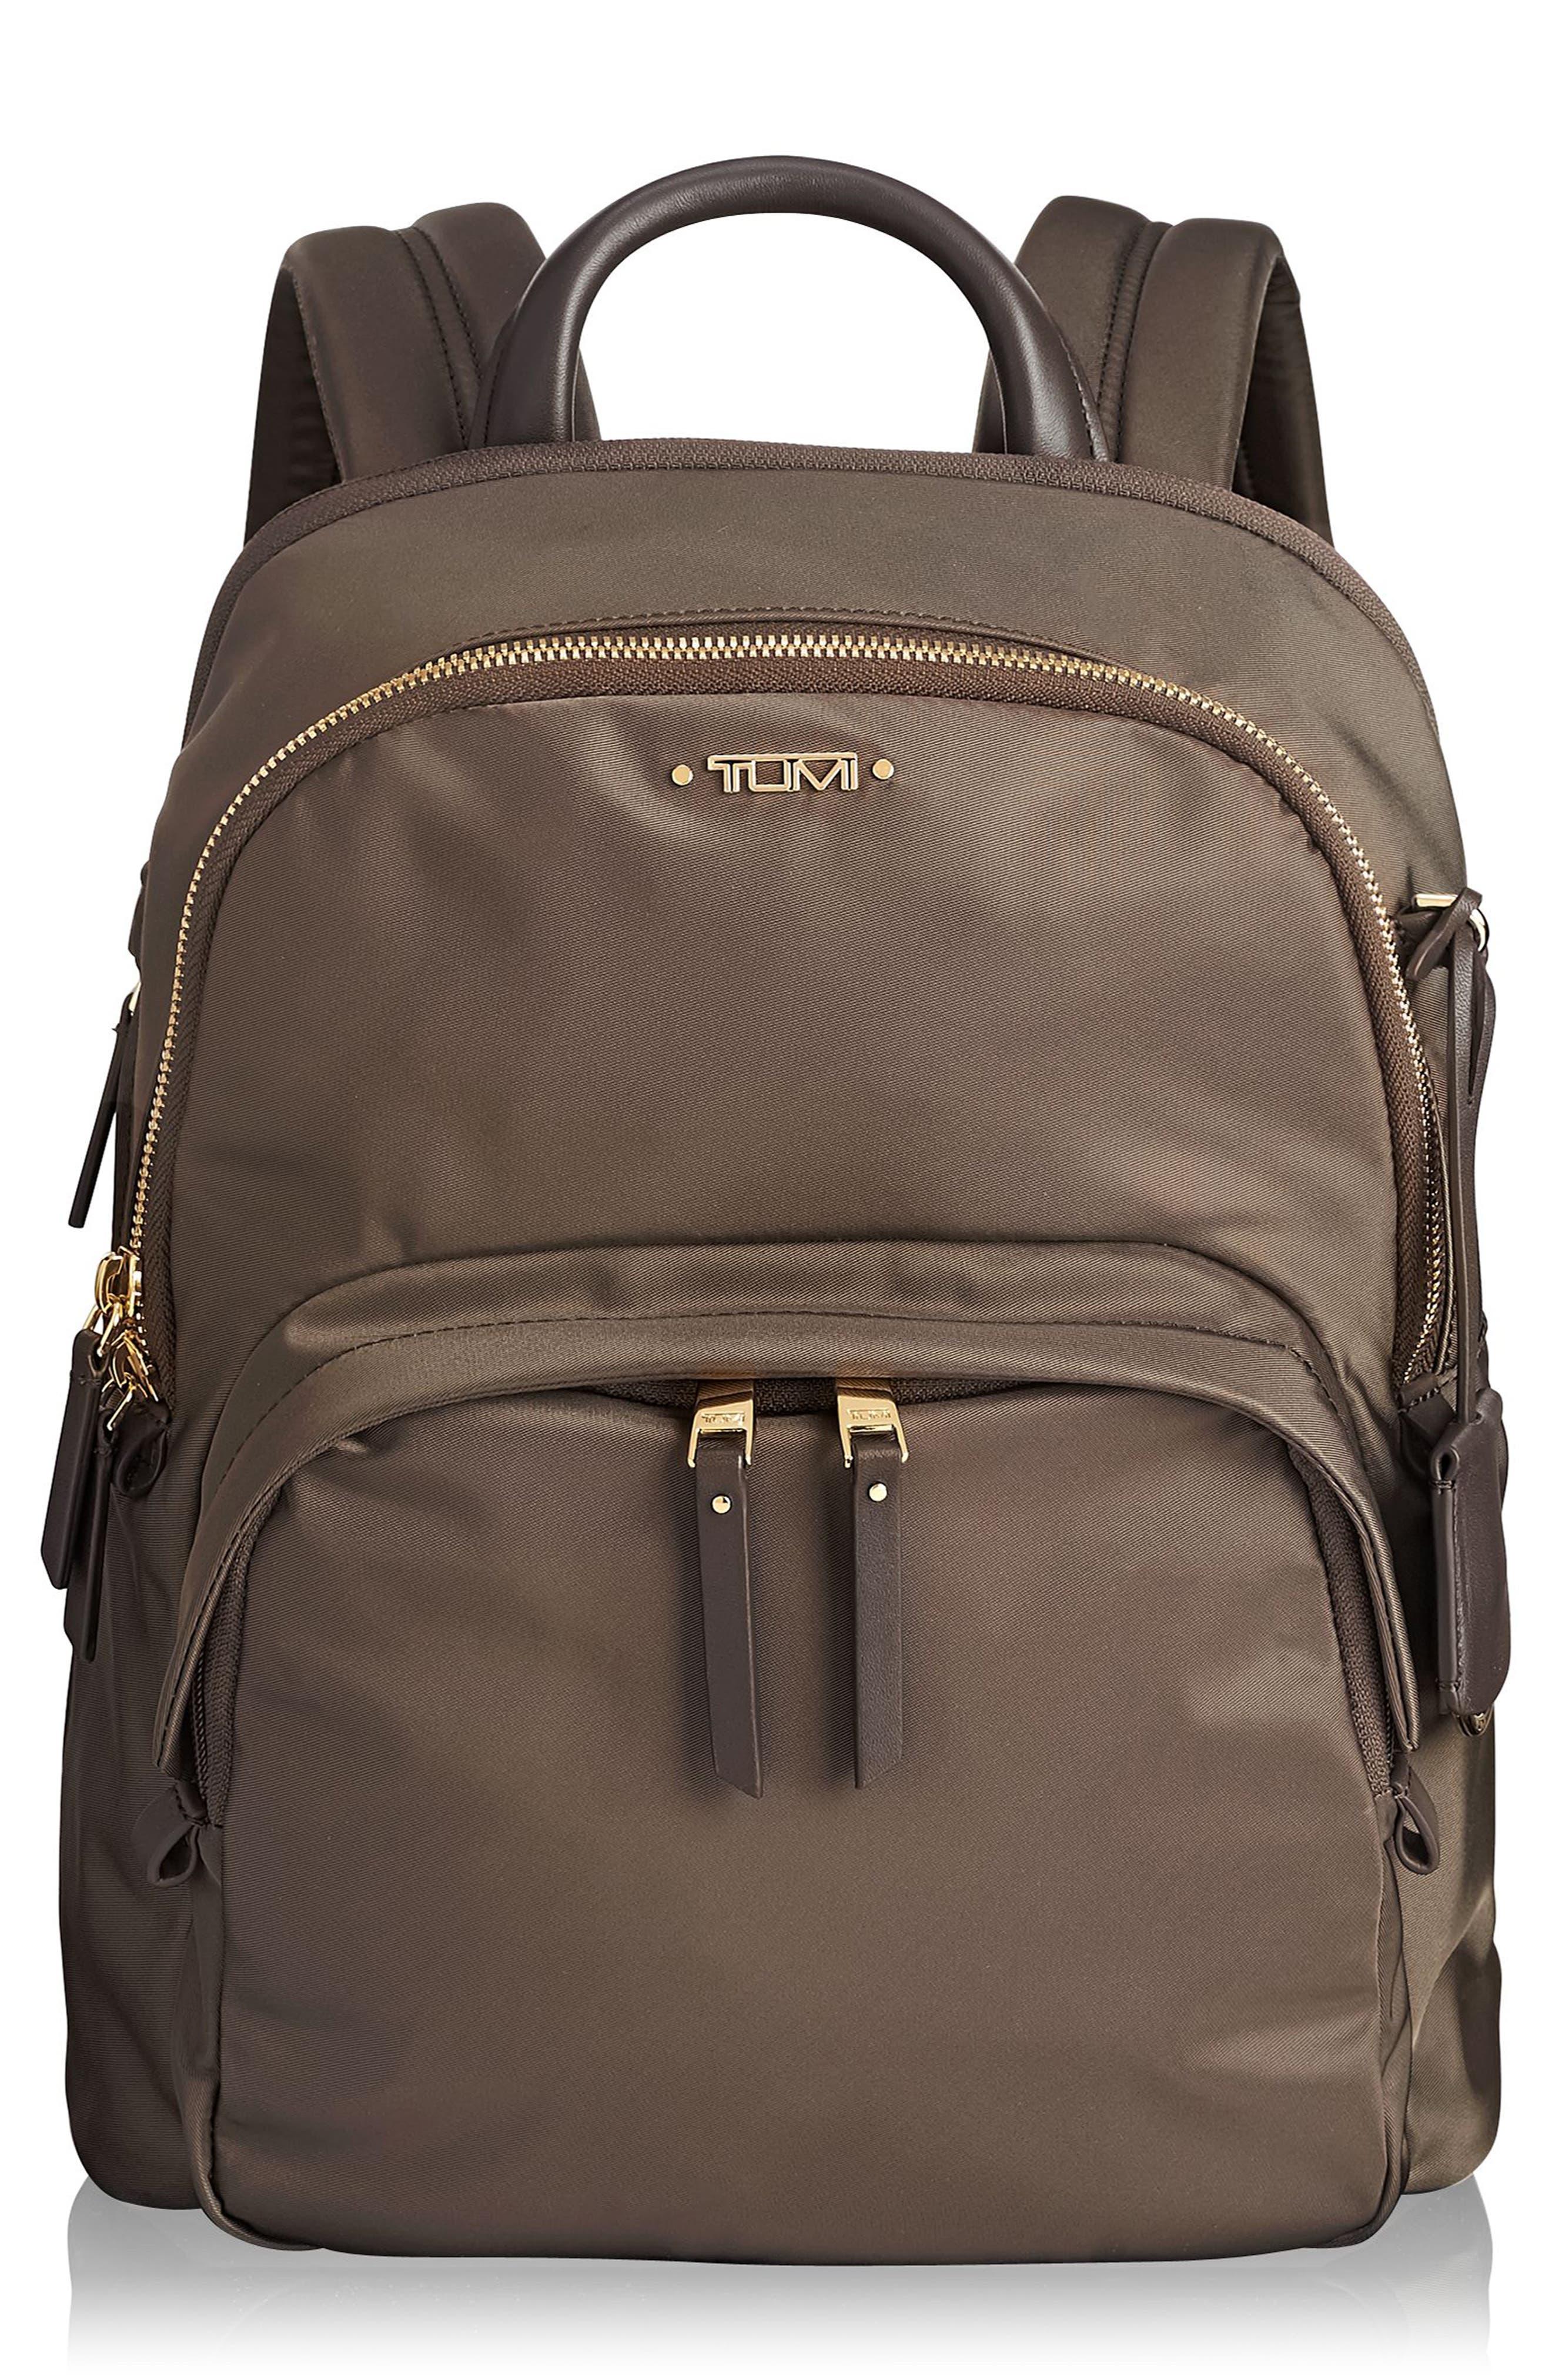 3cfa79d13f8 Tumi Mens Backpack Sale - CEAGESP